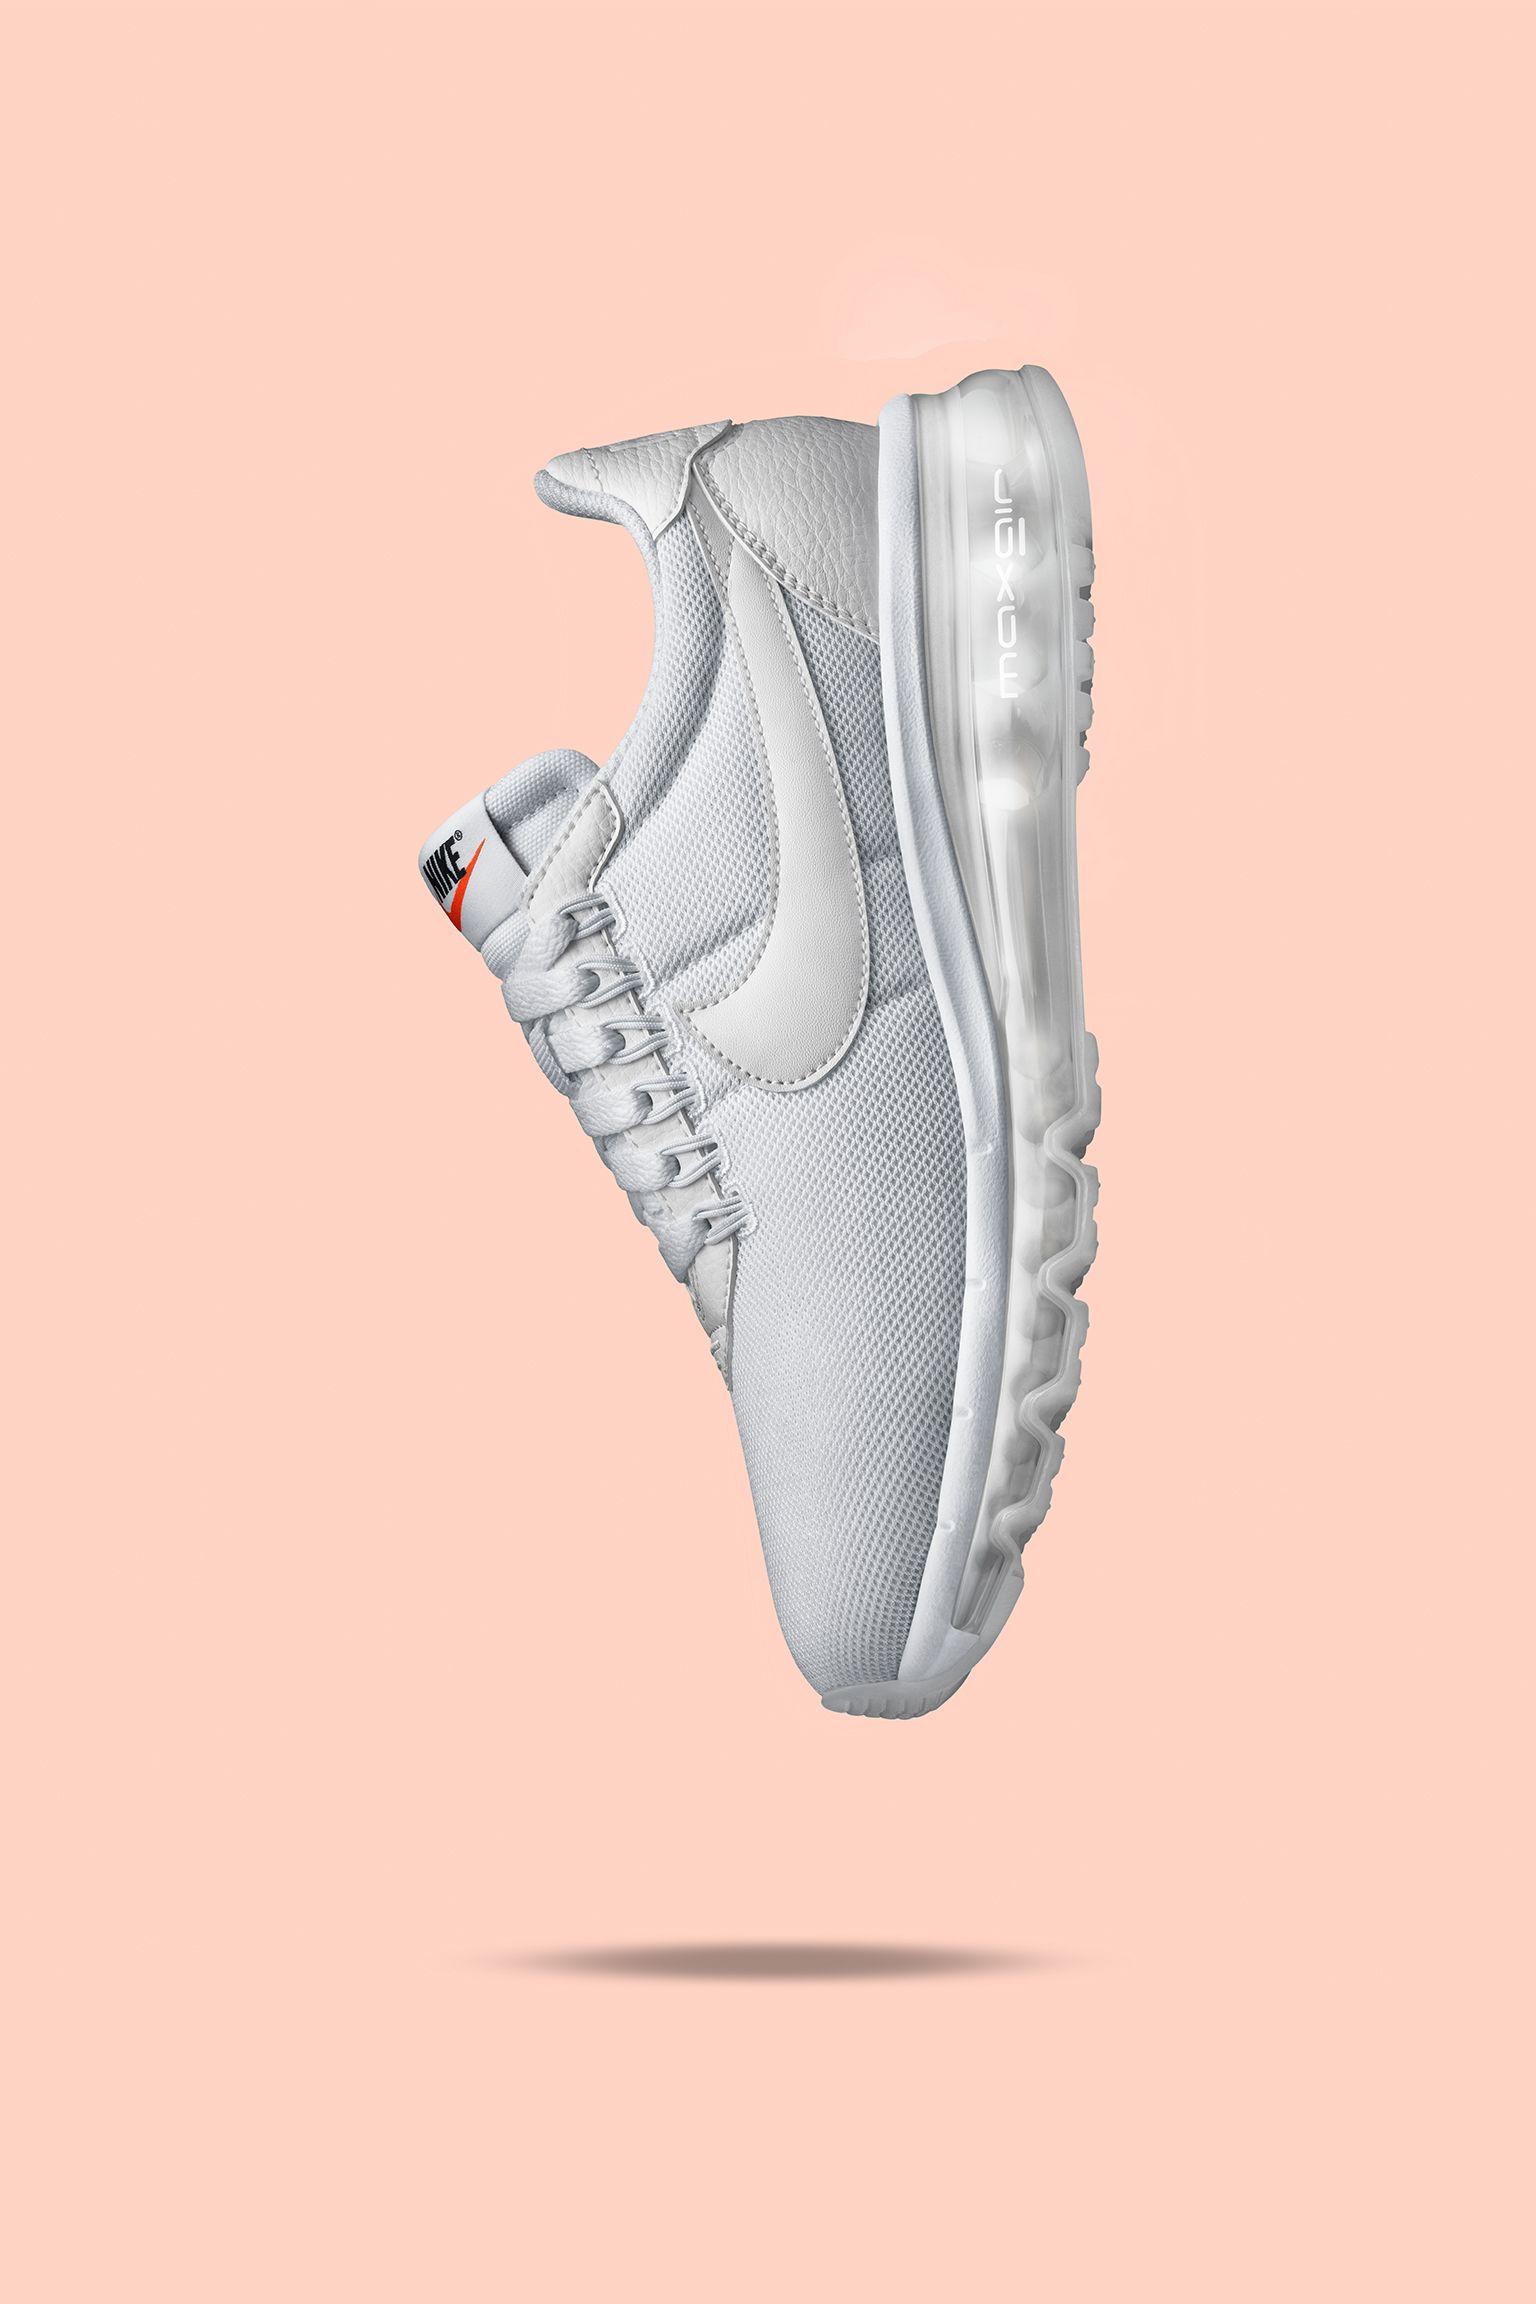 80d7002128 Women's Nike Air Max LD-ZERO 'Triple White'. Nike+ SNKRS